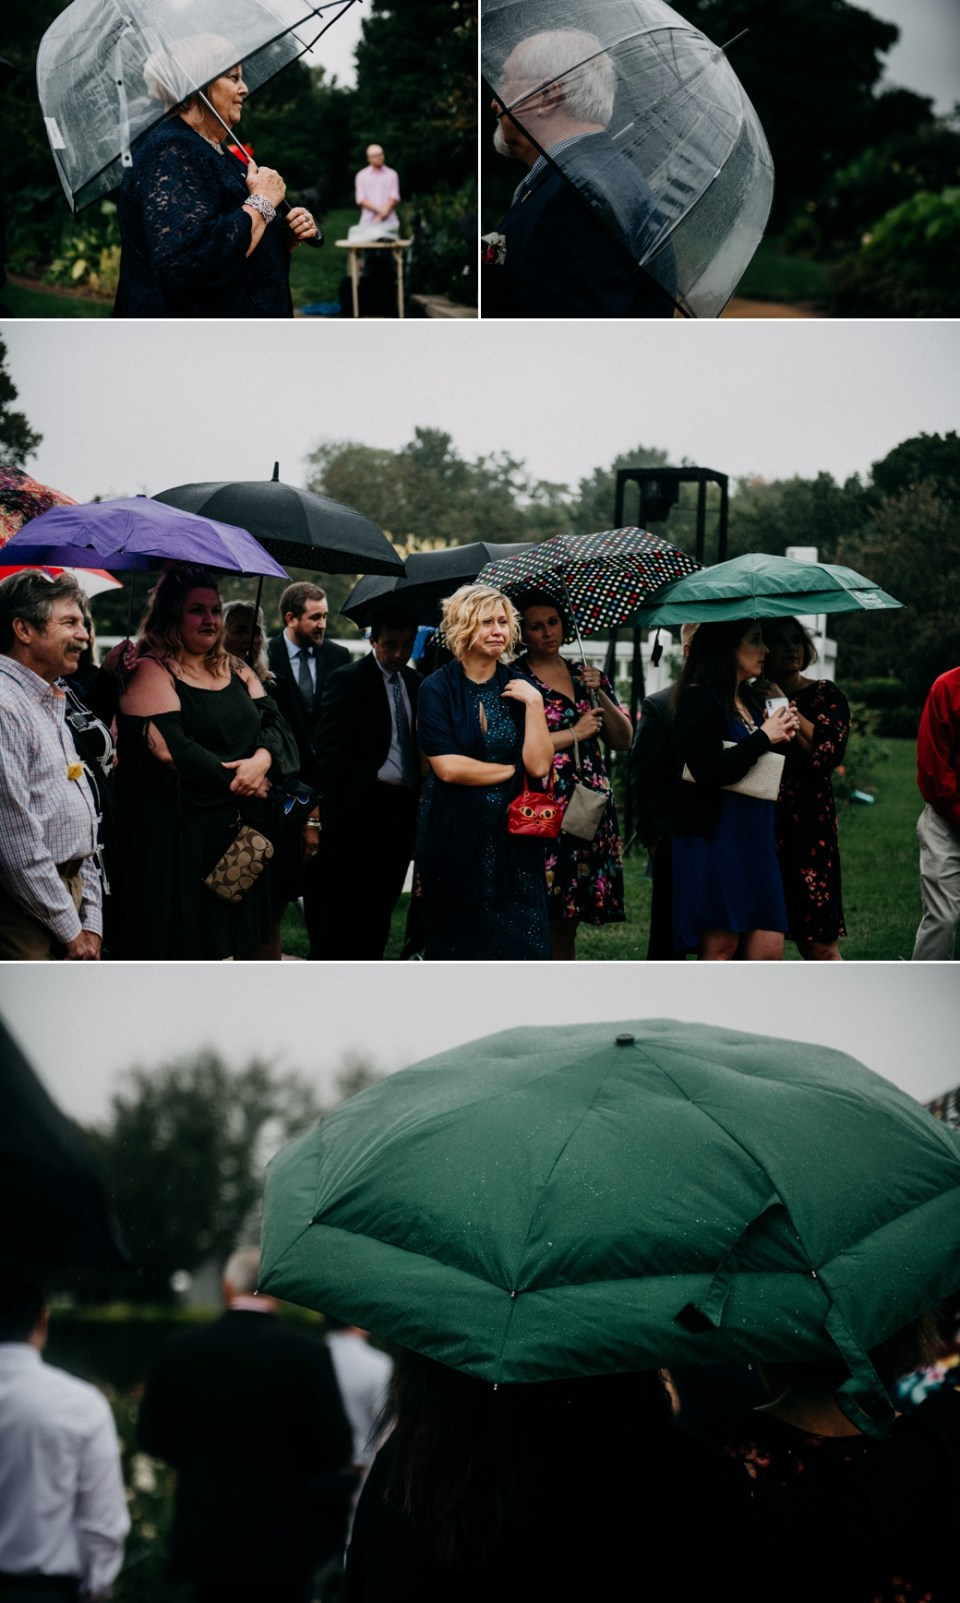 Rainy Day Wedding Photos in St Louis